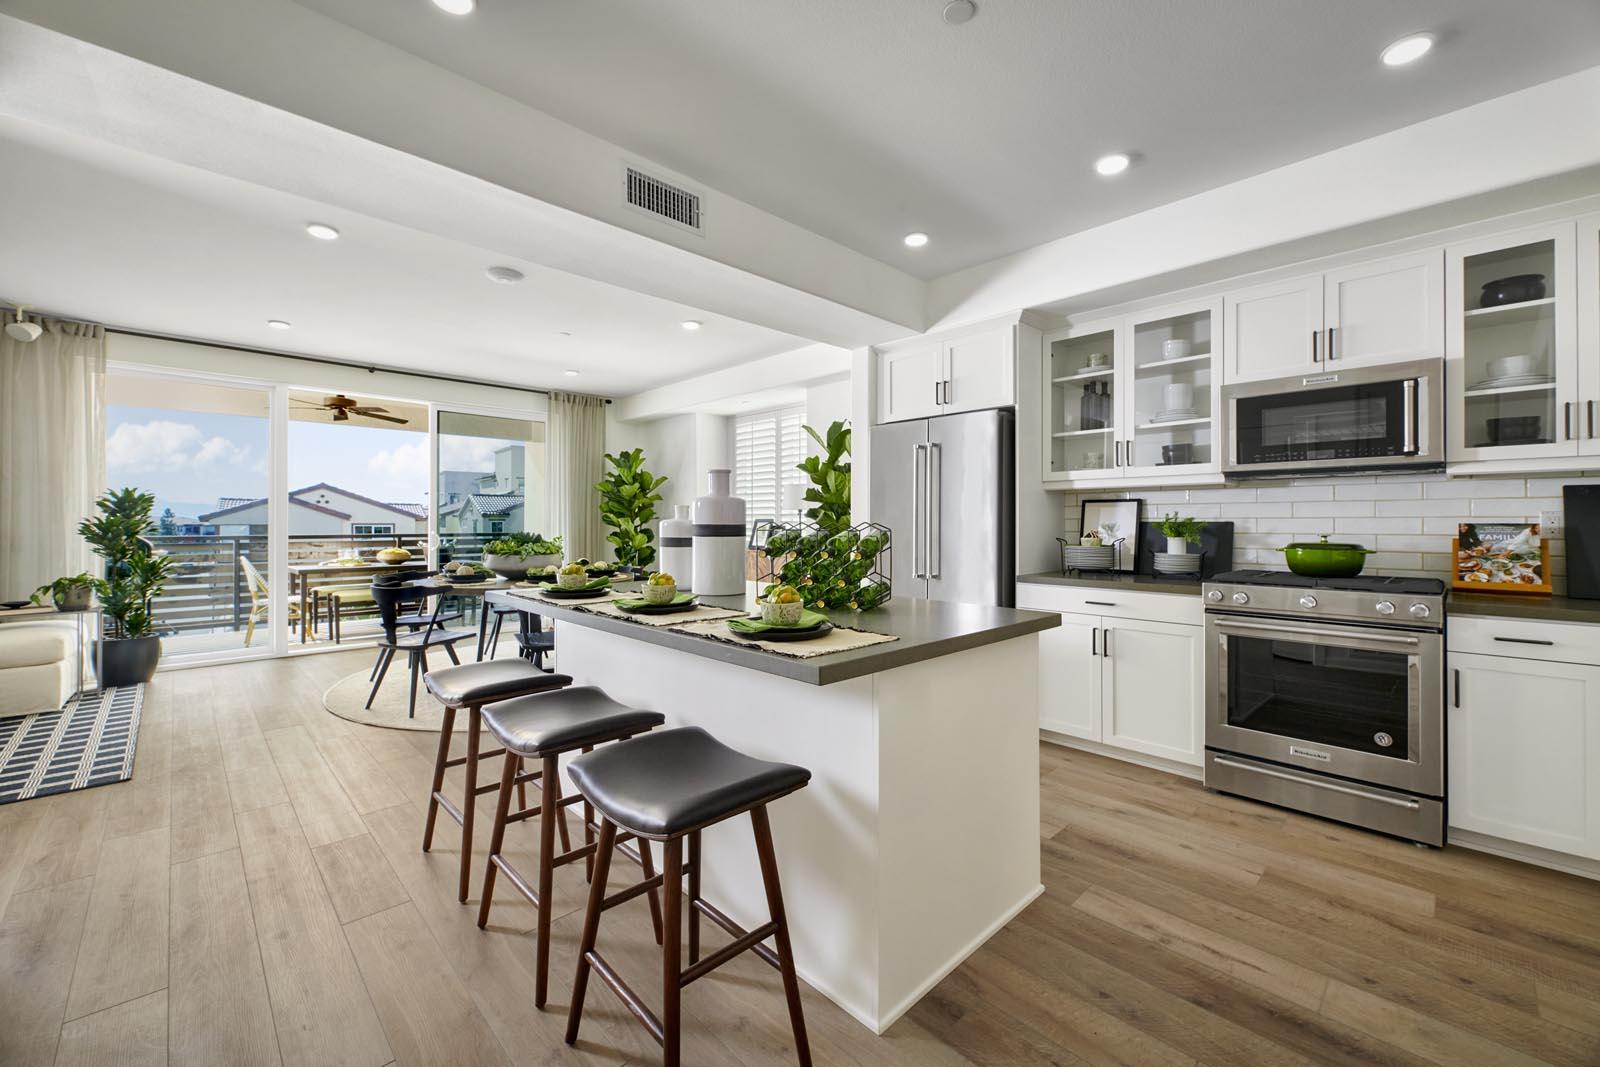 Kitchen | Residence 3 | Aspire | New Homes in Rancho Cucamonga, CA | Van Daele Homes